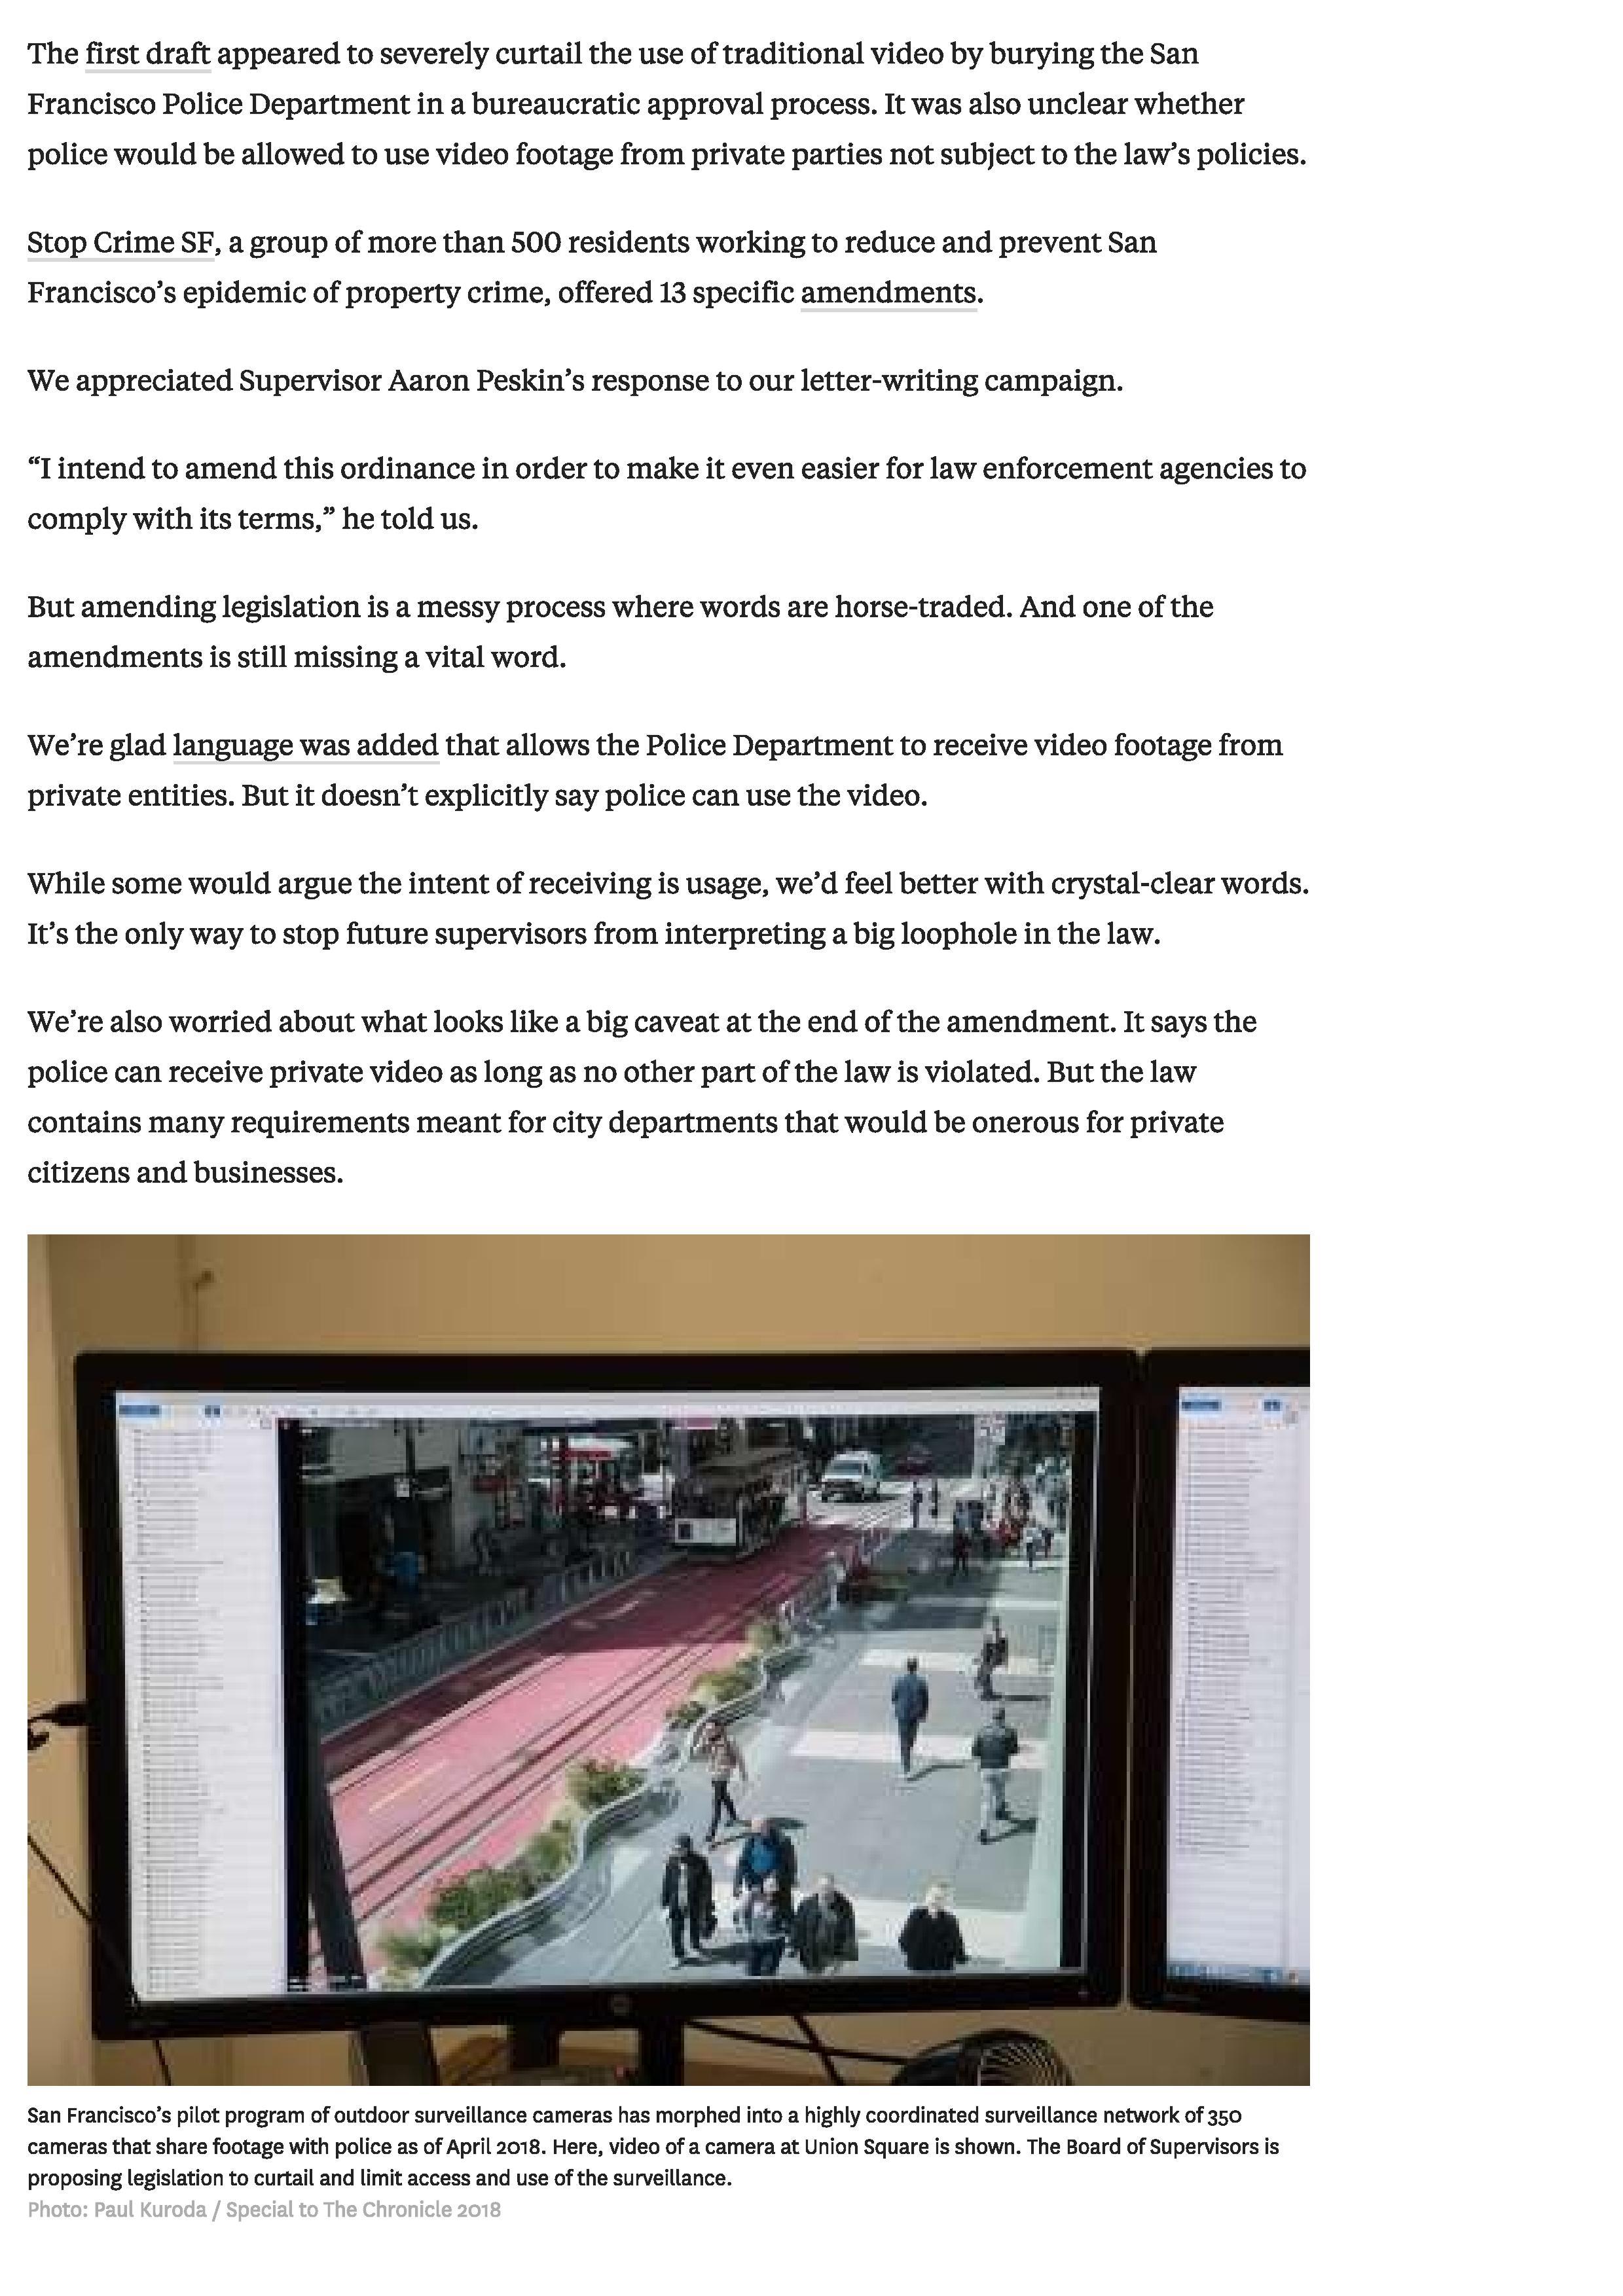 Chronicle Surveillance Ban2_May1_2019b.jpg